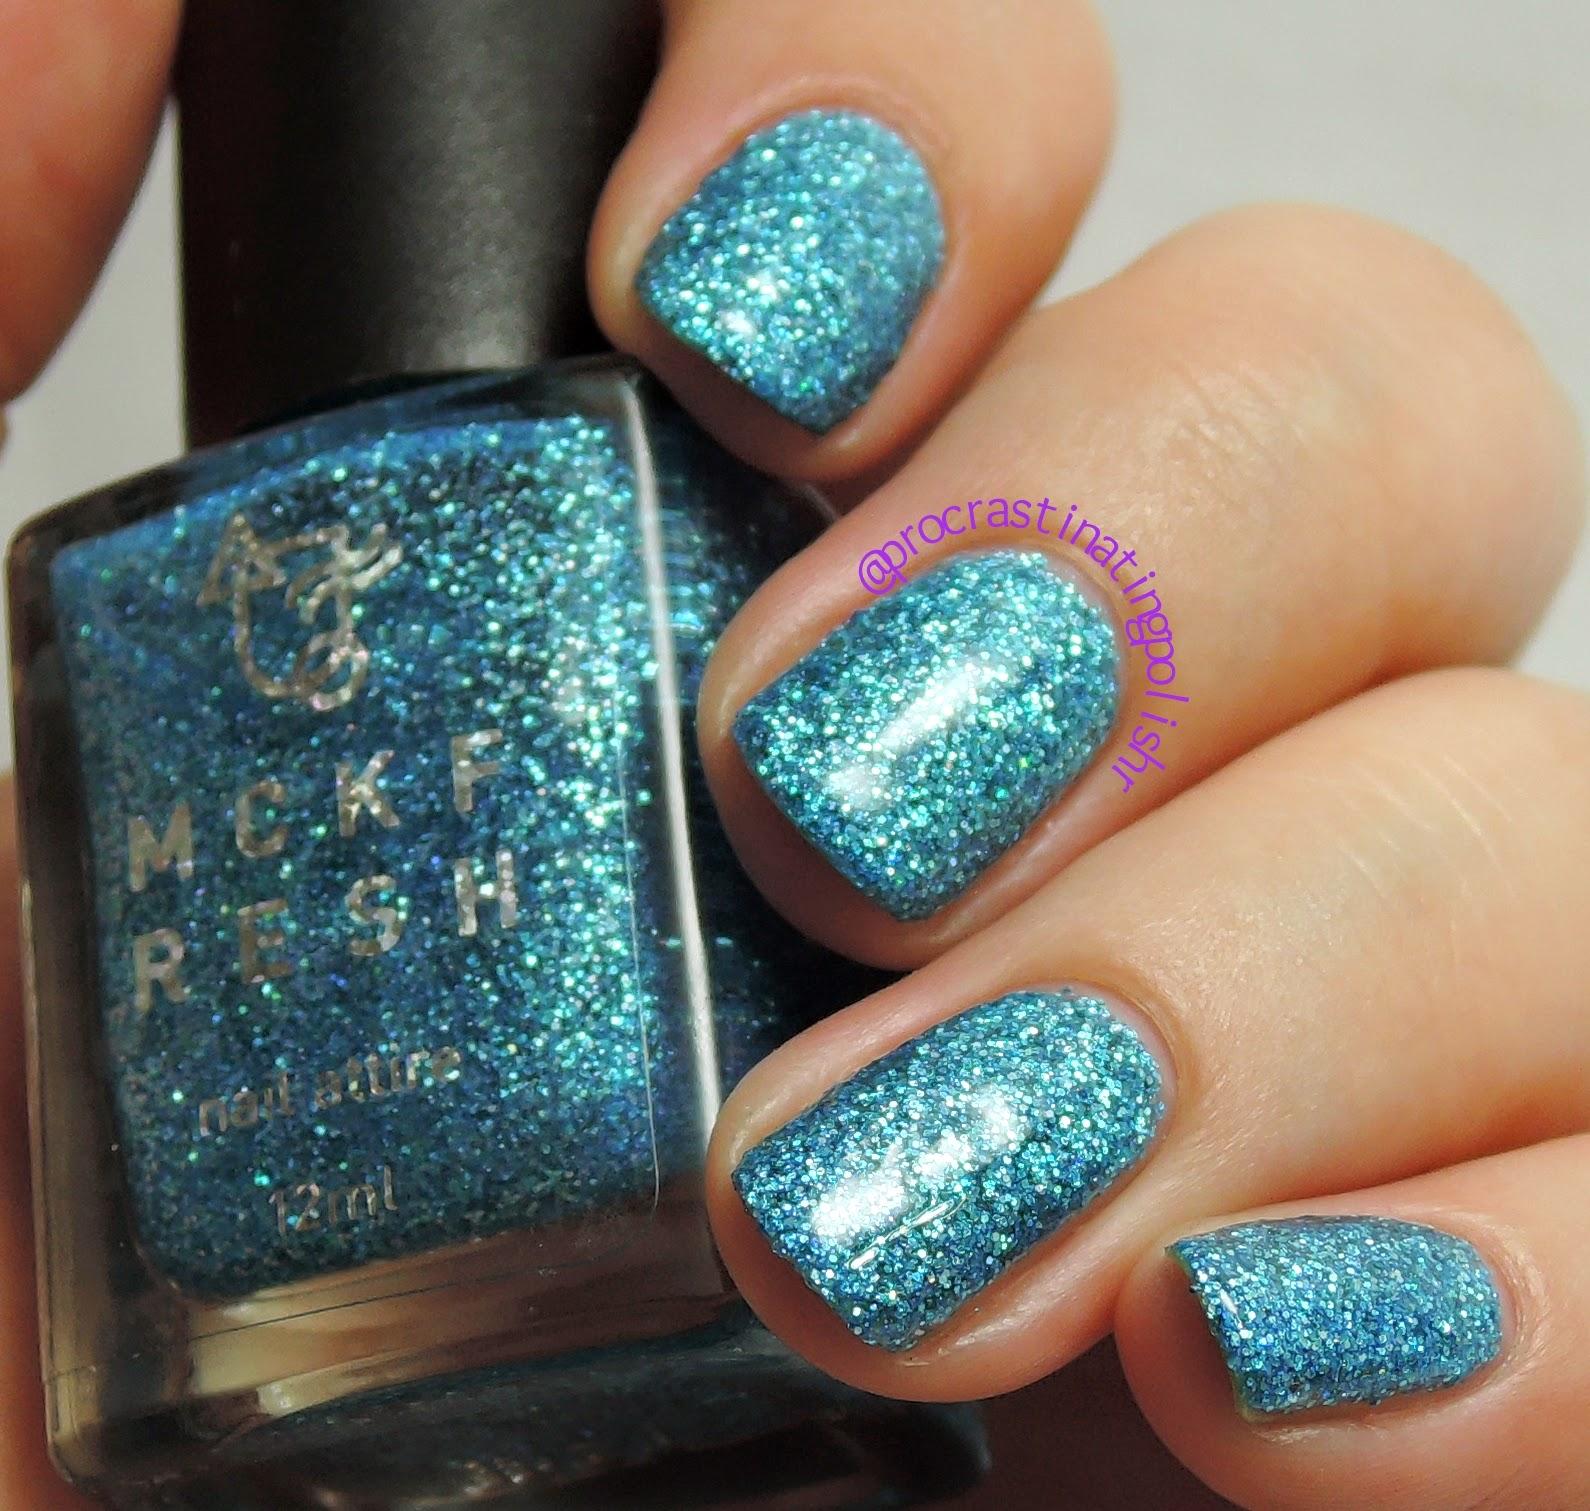 Mckfresh Nail Attire - Zircon Sky